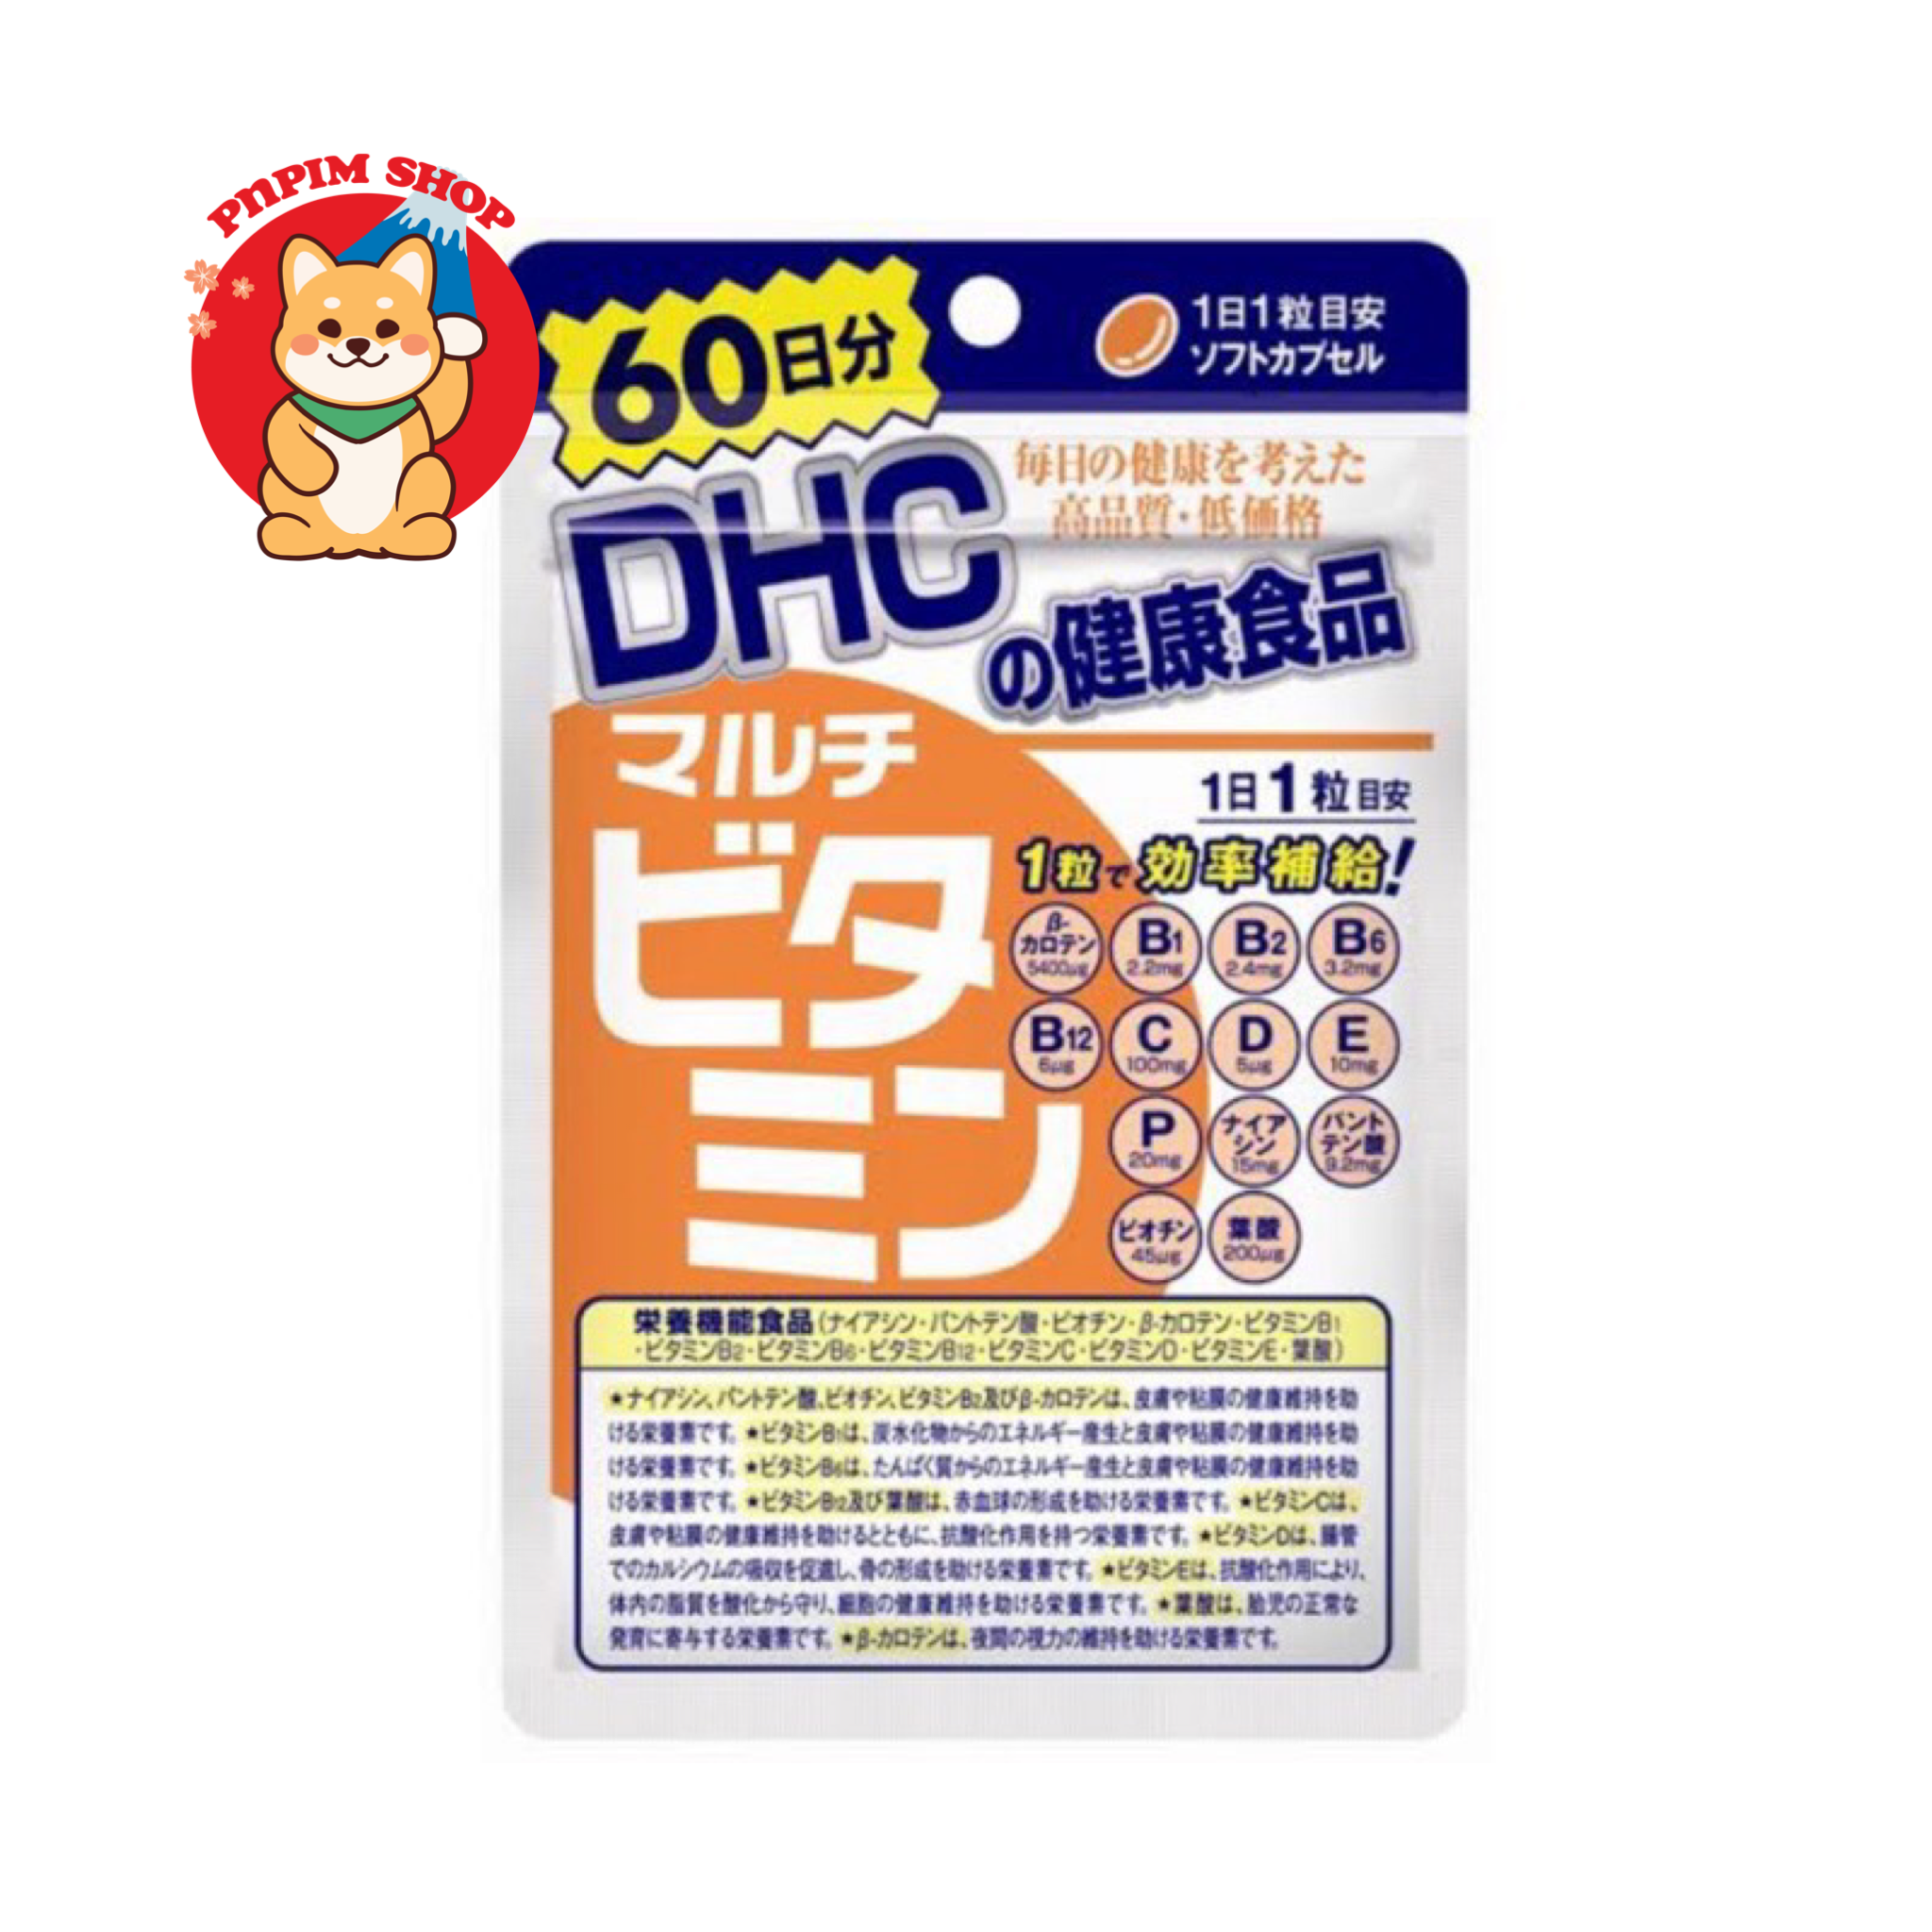 DHC Multi Vitamin ดีเอชซี วิตามินรวม (60 days)